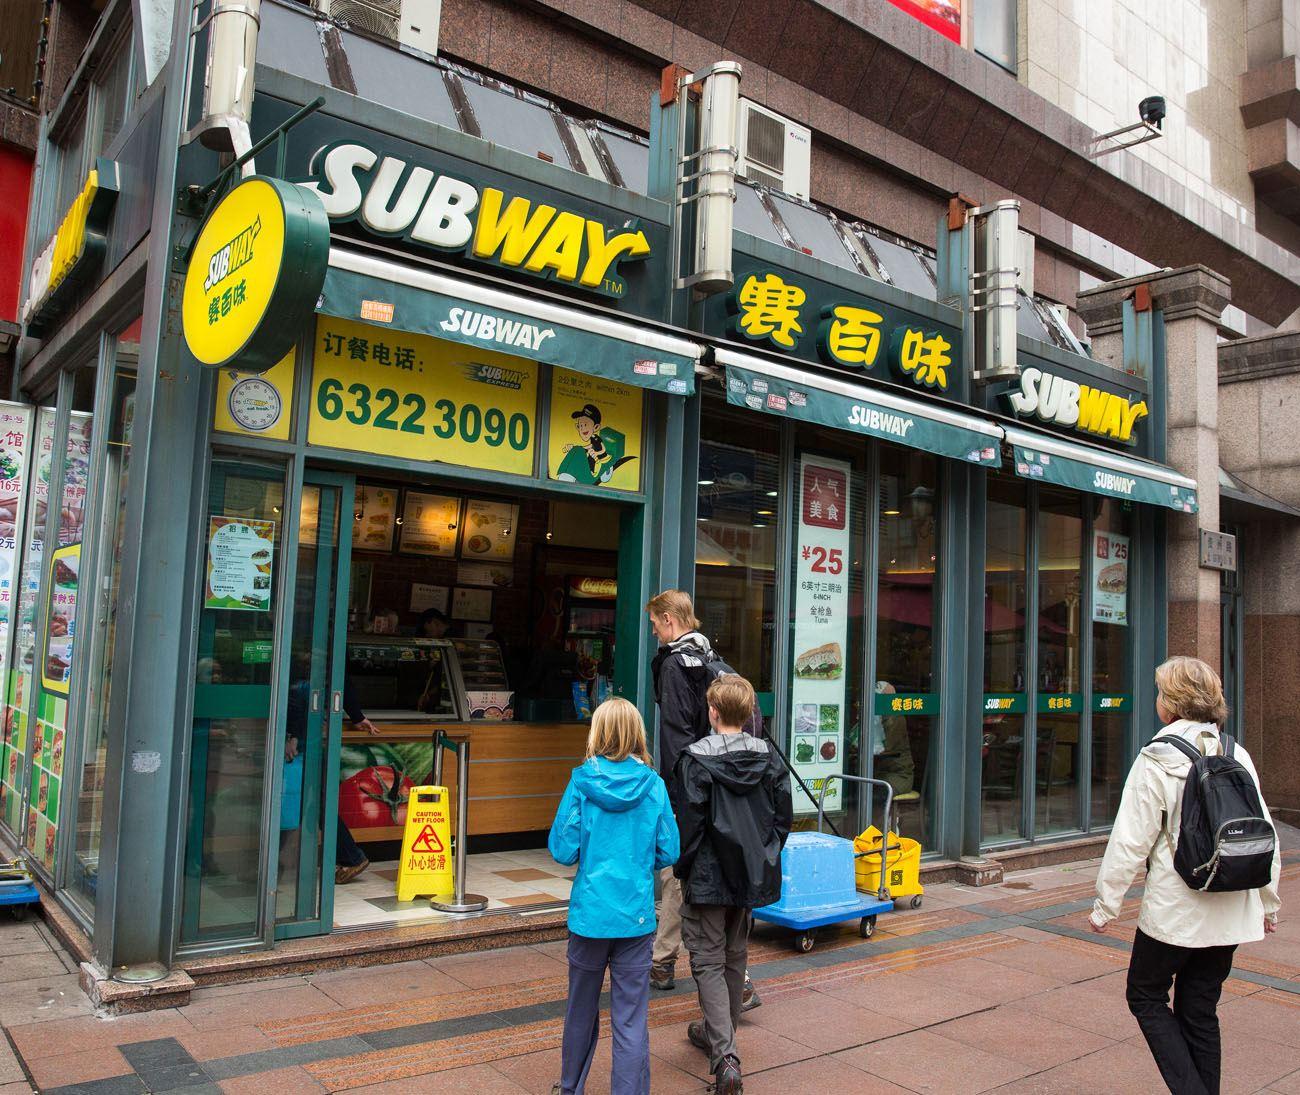 Subway in Shanghai